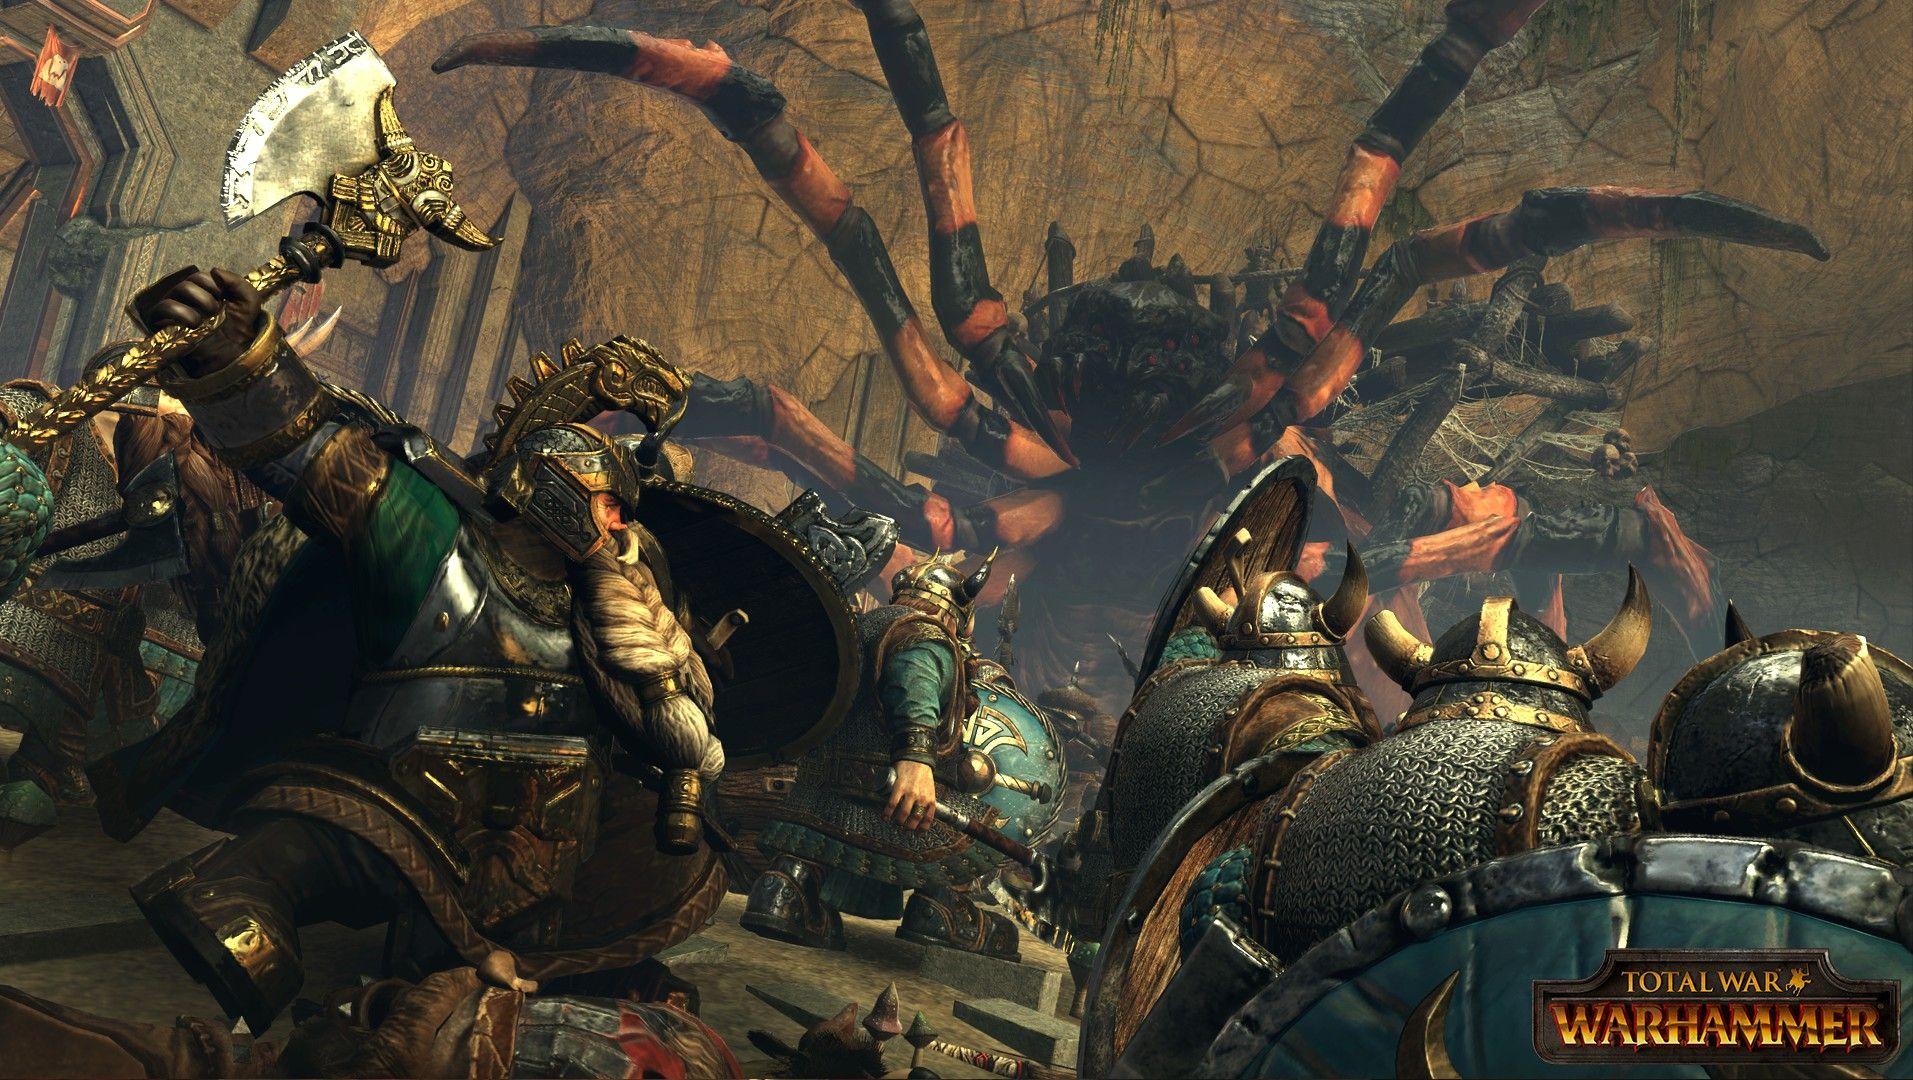 Pin By Zachary Logsdon On Warhammer Fantasy Warhammer Total War High Resolution Wallpapers